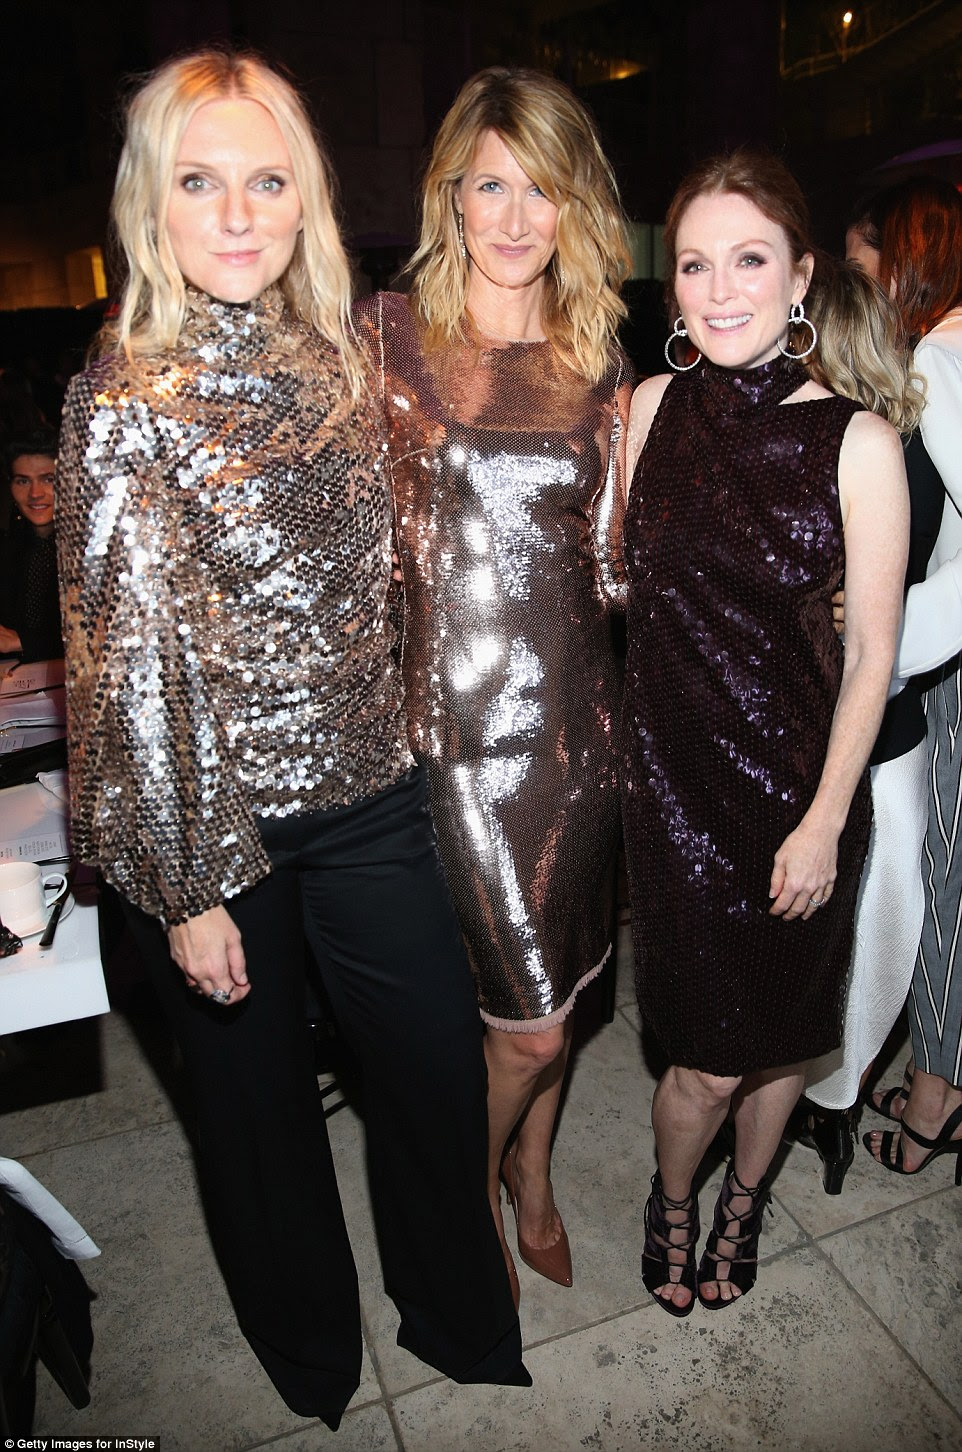 Tudo o que reluz: editor-chefe Laura Brown cosied a atores Julianne Moore e Laura Dern